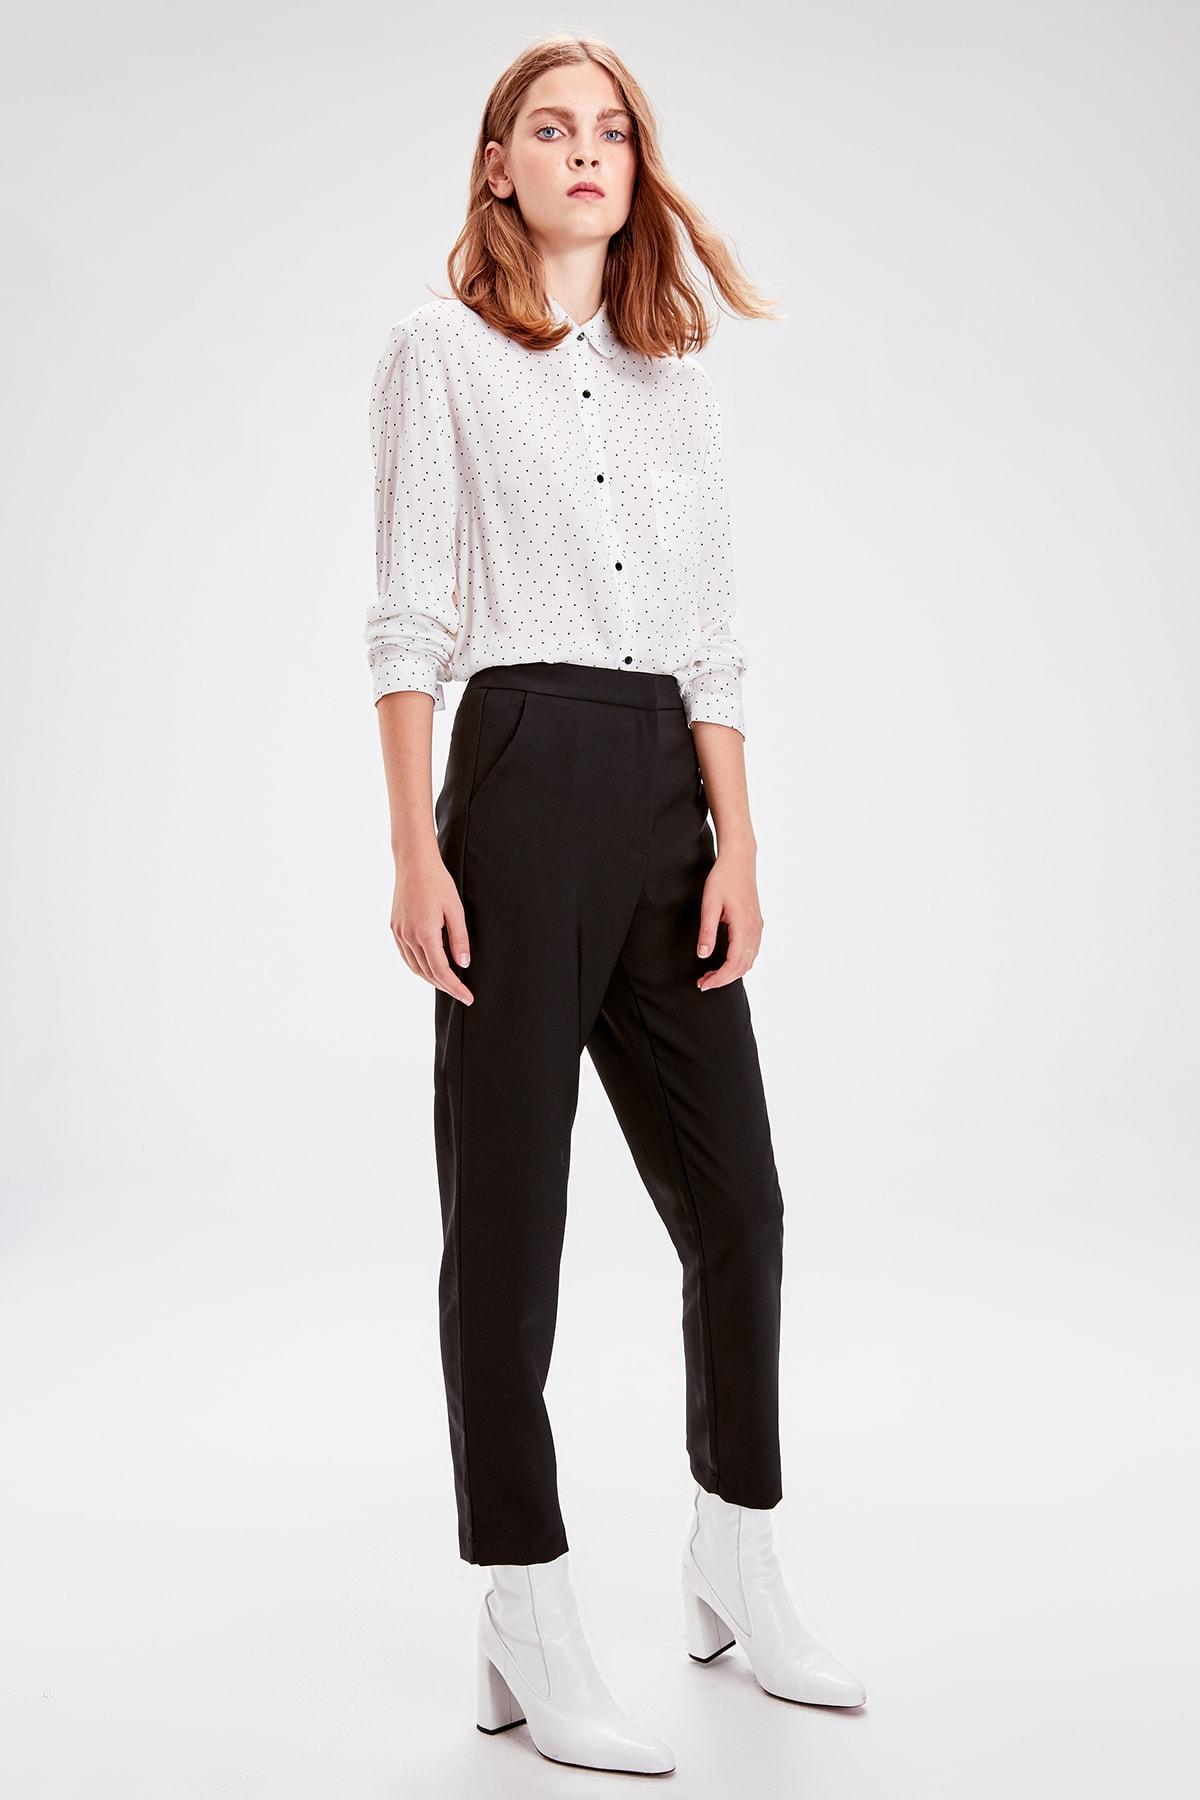 Trendyol Black Tight Bell-Bottomed Pants TWOAW20PL0060